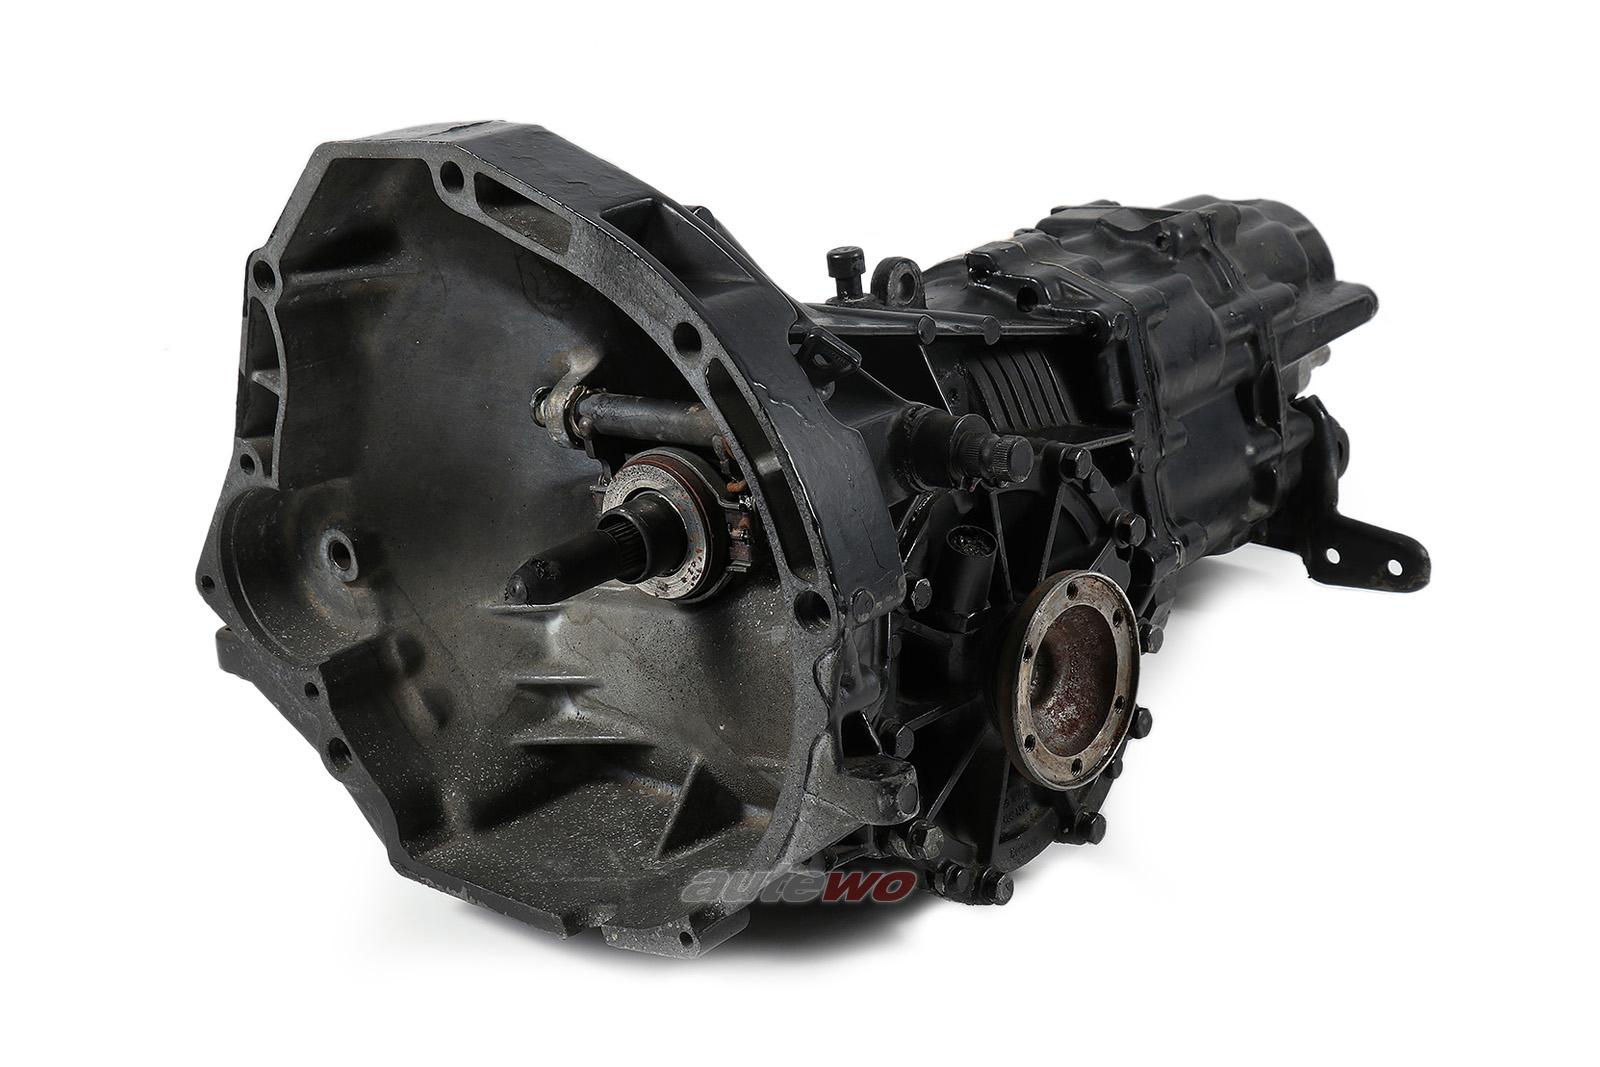 013300041NX NEU Audi/VW 80/Coupe Typ 81 1.6l 5-Gang-Schaltgetriebe 9Q